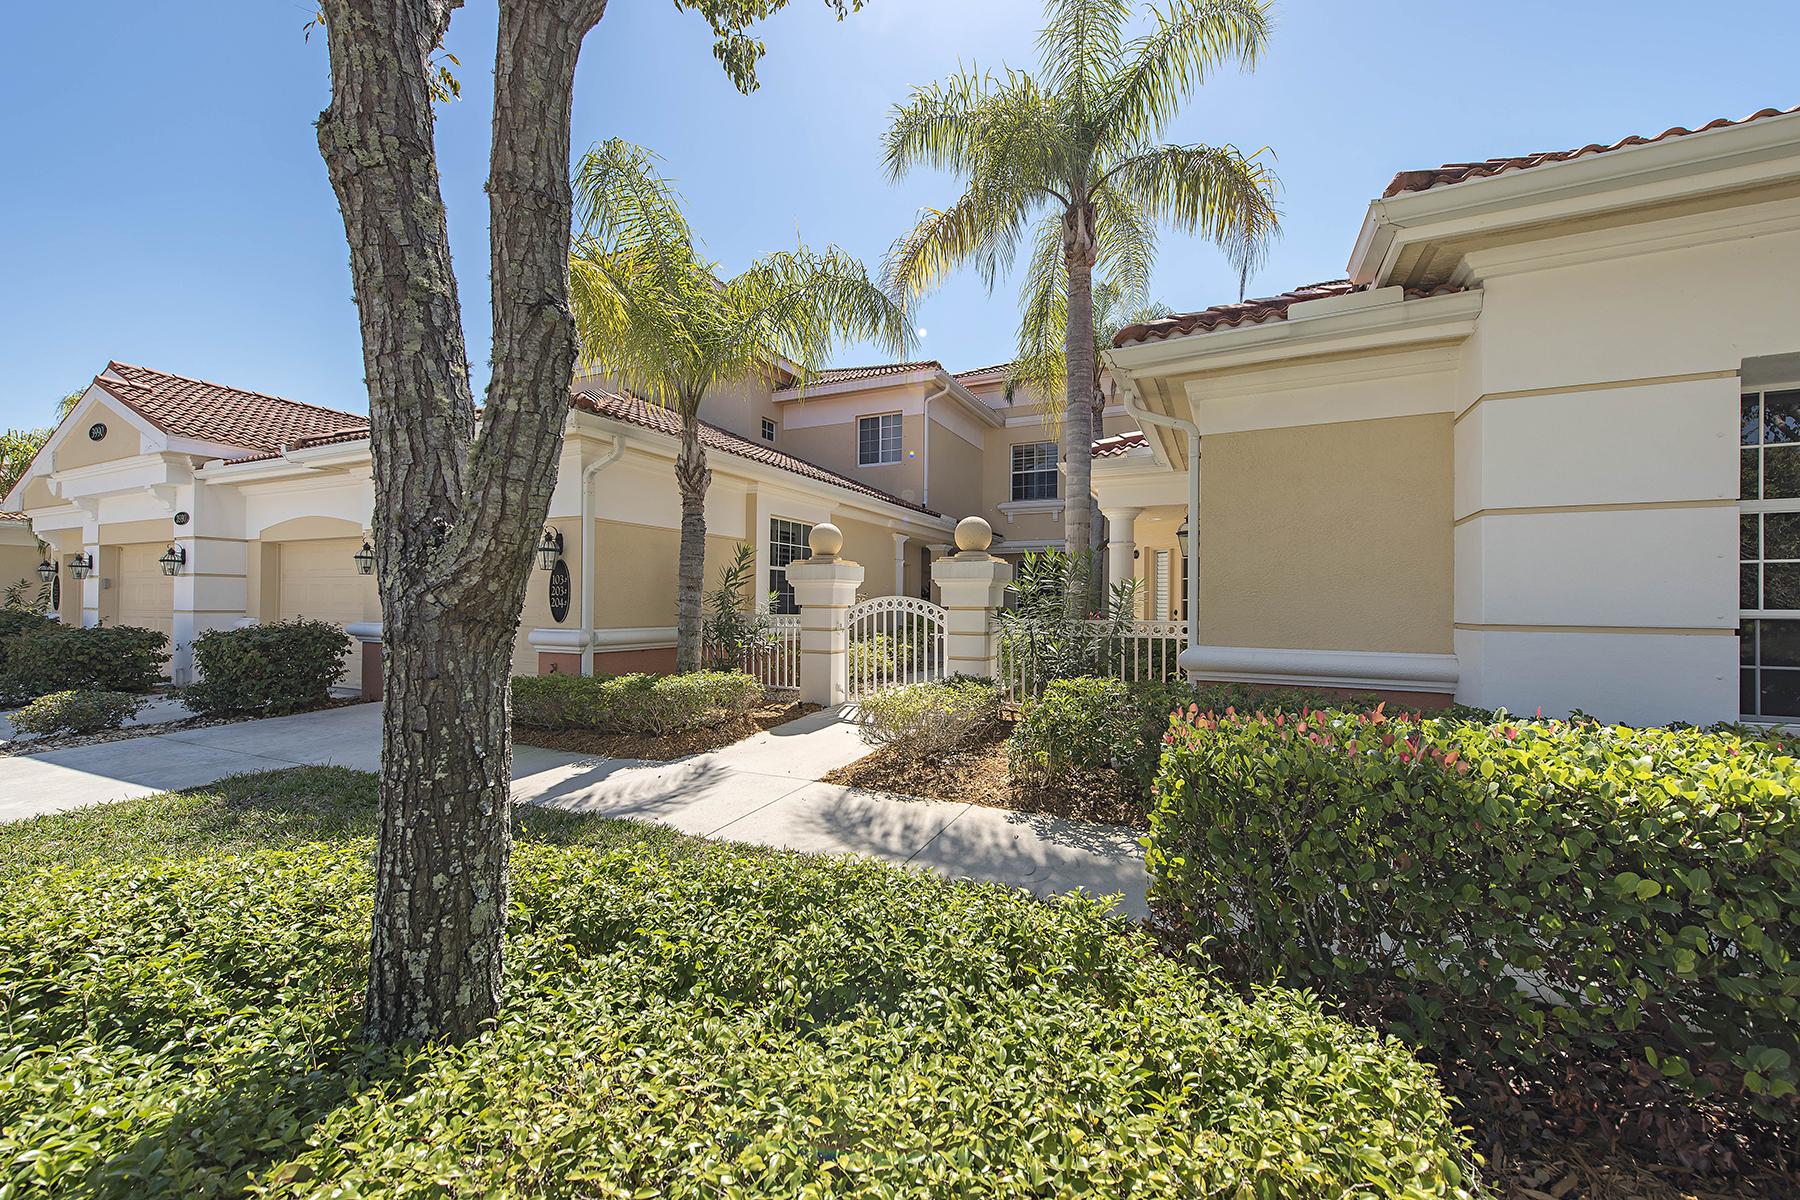 Condominium for Sale at FIDDLER'S CREEK - DEER CROSSING 3990 Deer Crossing Ct 103 Naples, Florida 34114 United States